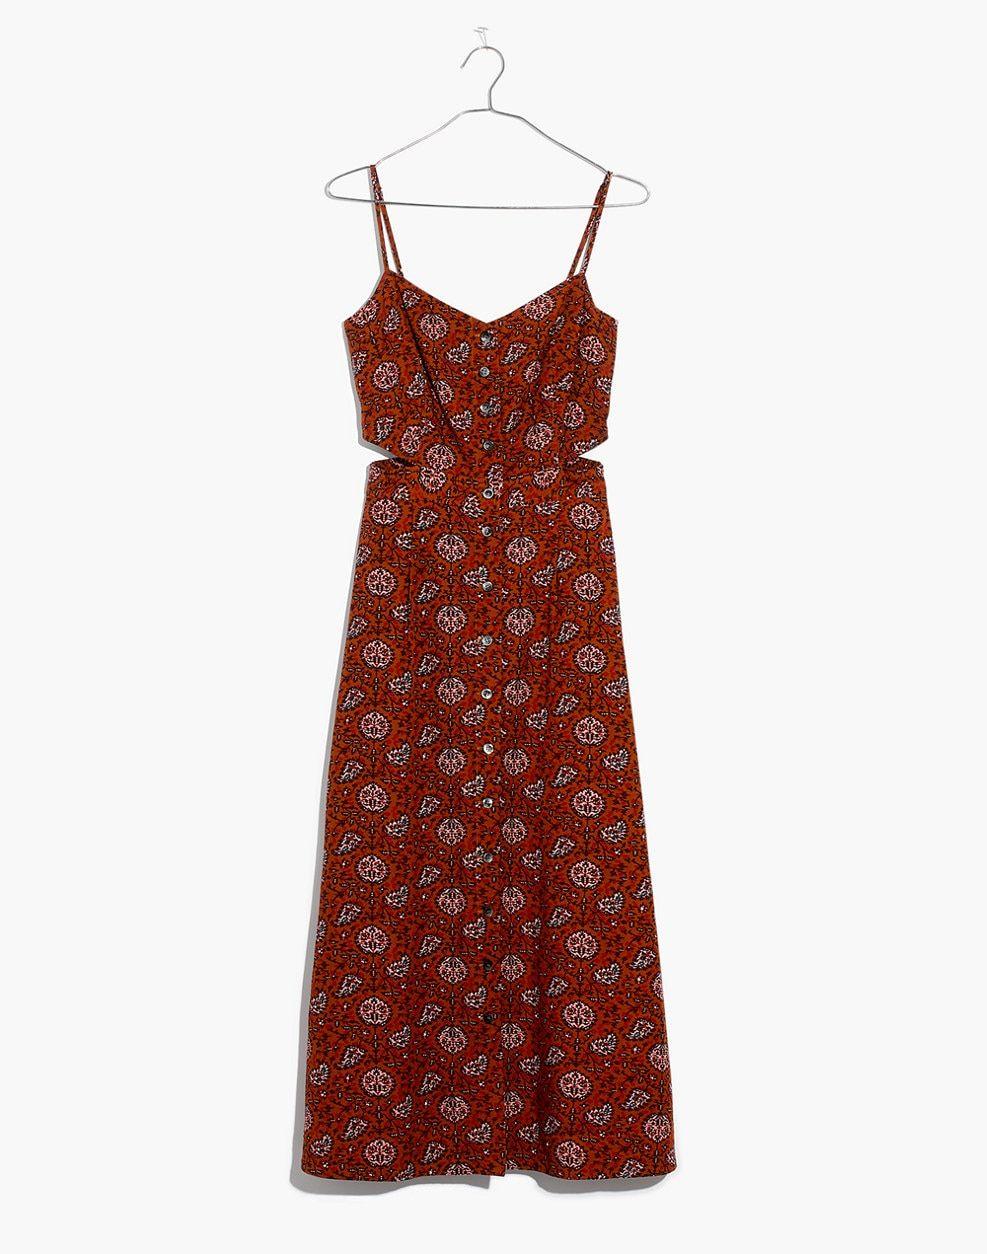 684bcb78a16 Cutout Cami Midi Dress in Warm Paisley   dresses   skirts